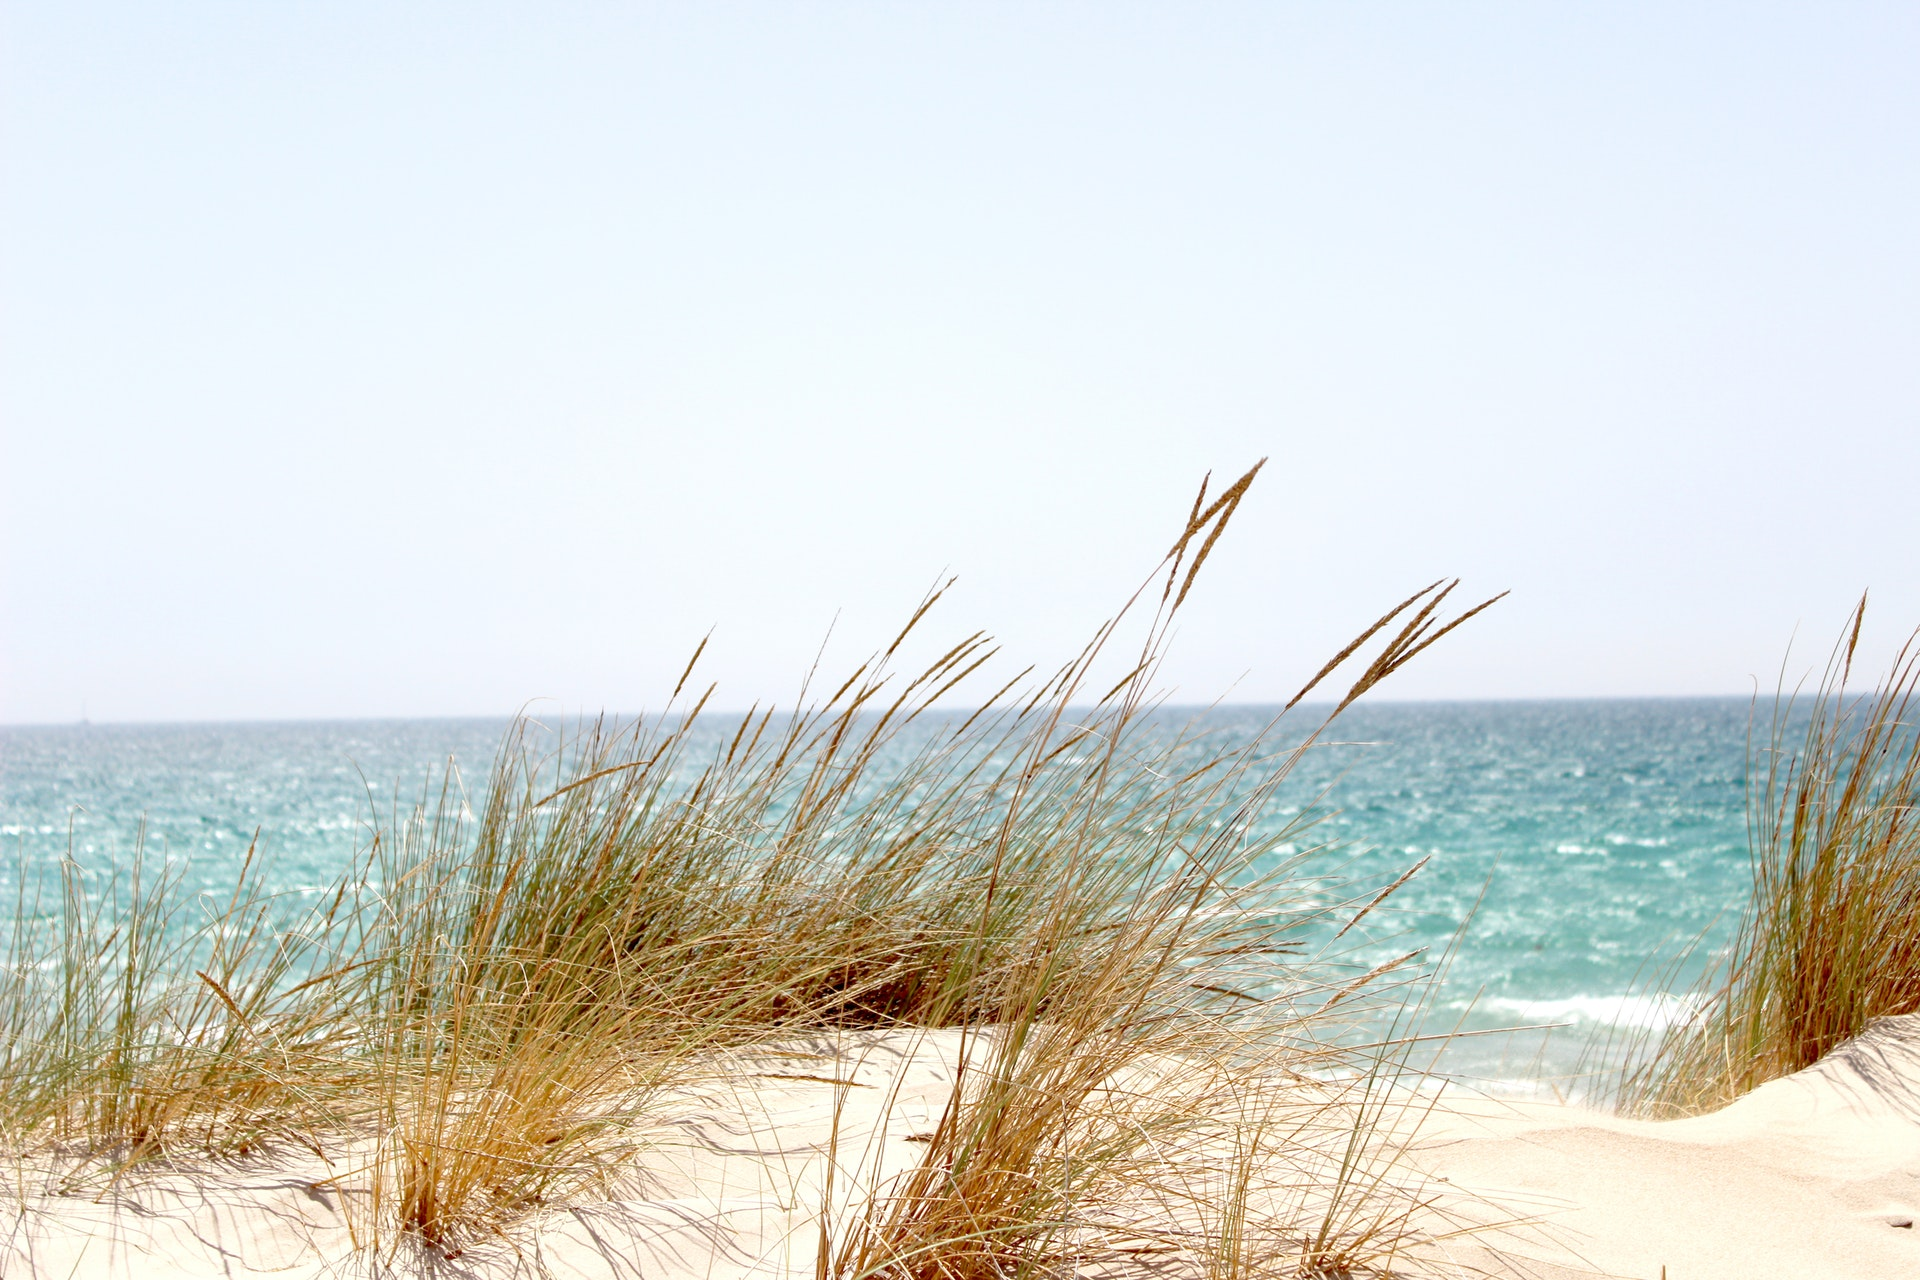 sea oats in Mexico Beach, FL